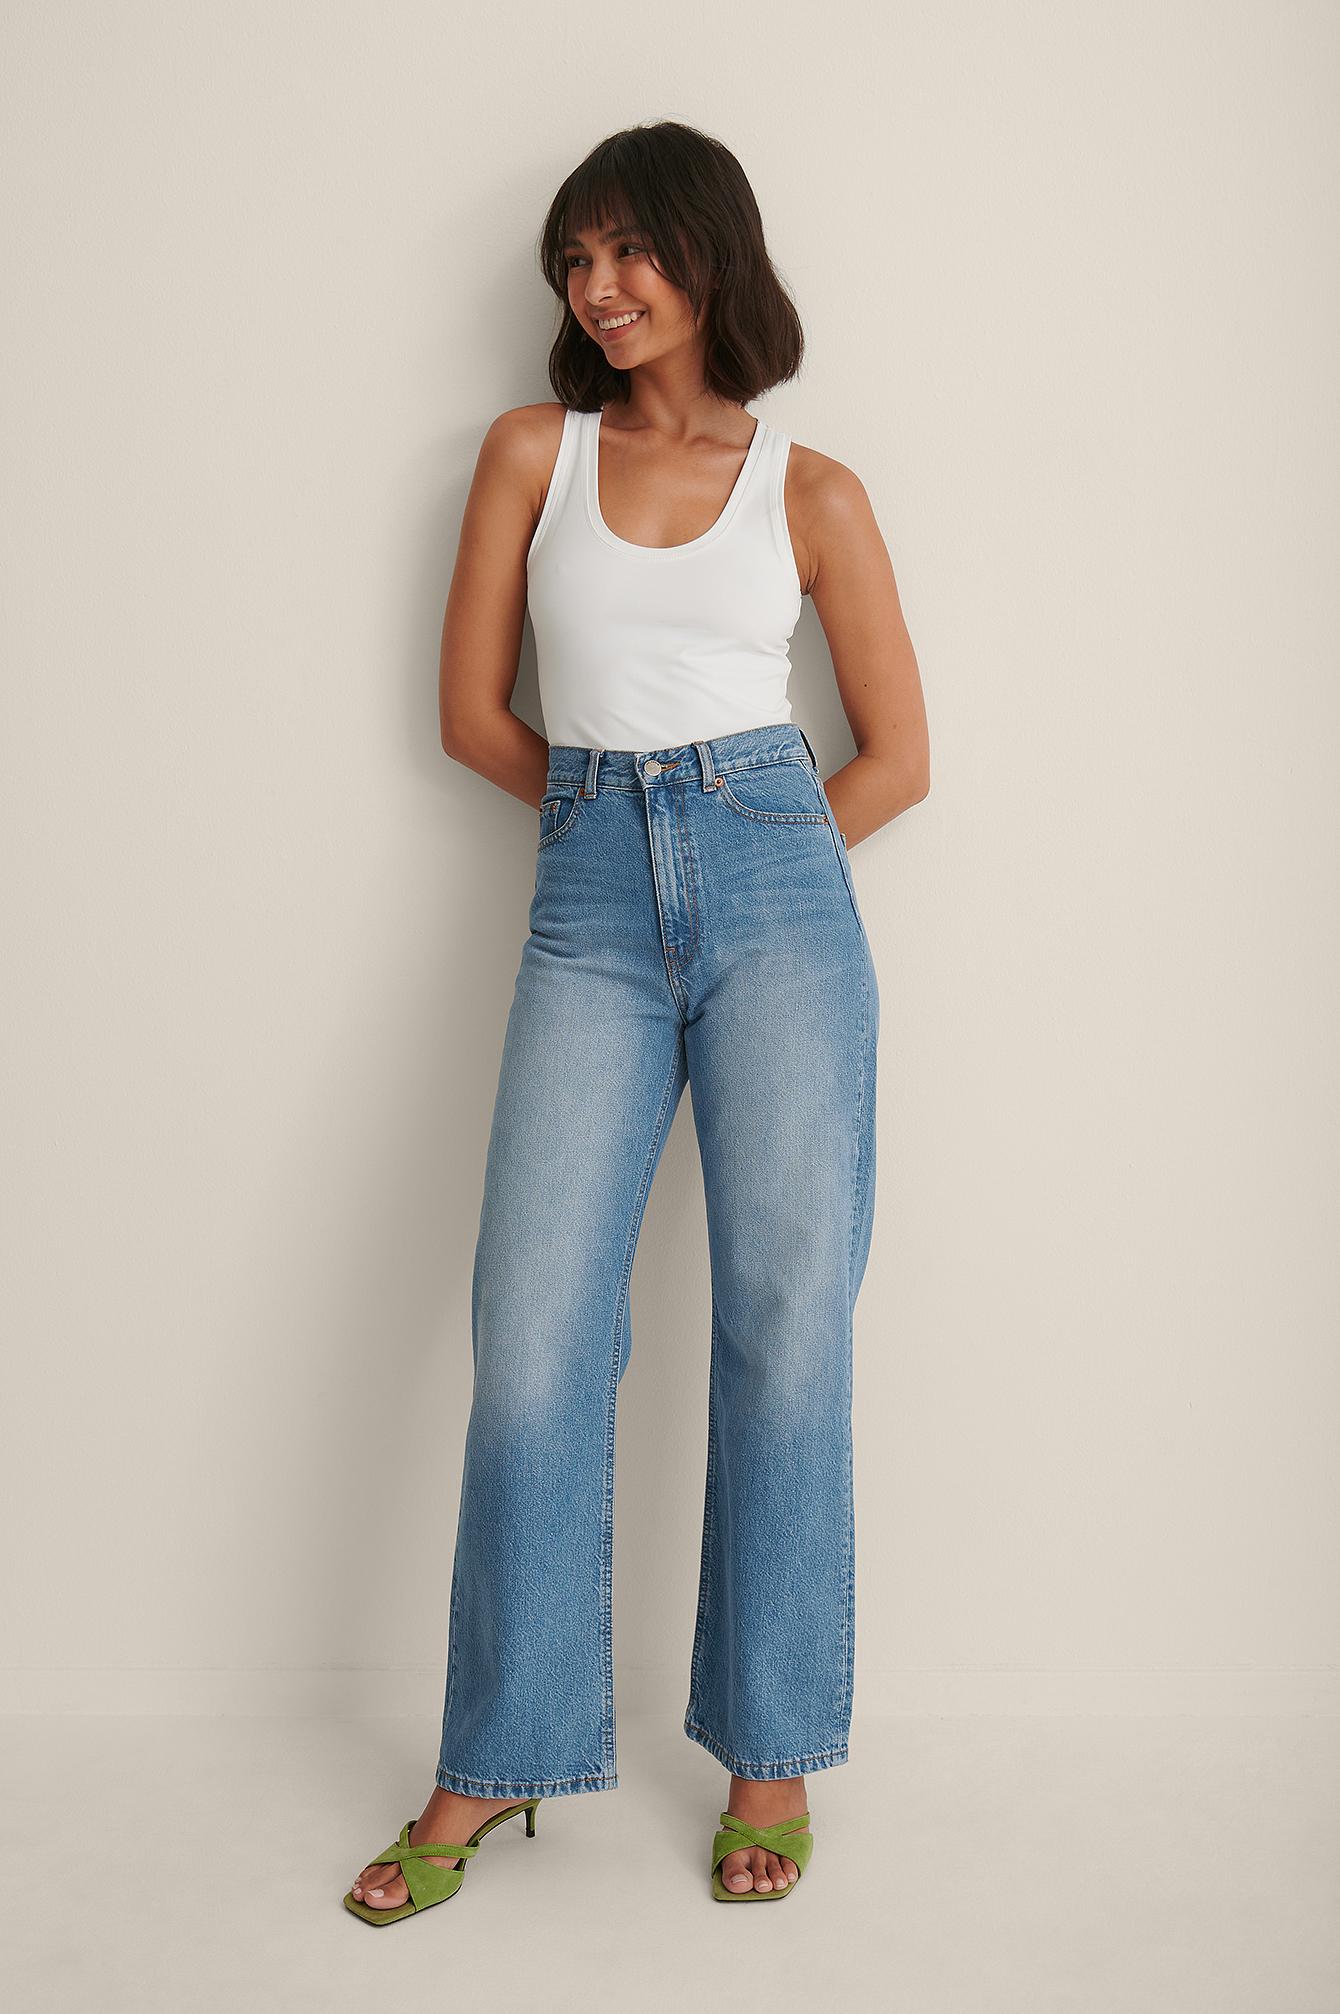 Dr Denim Jeans - Blue